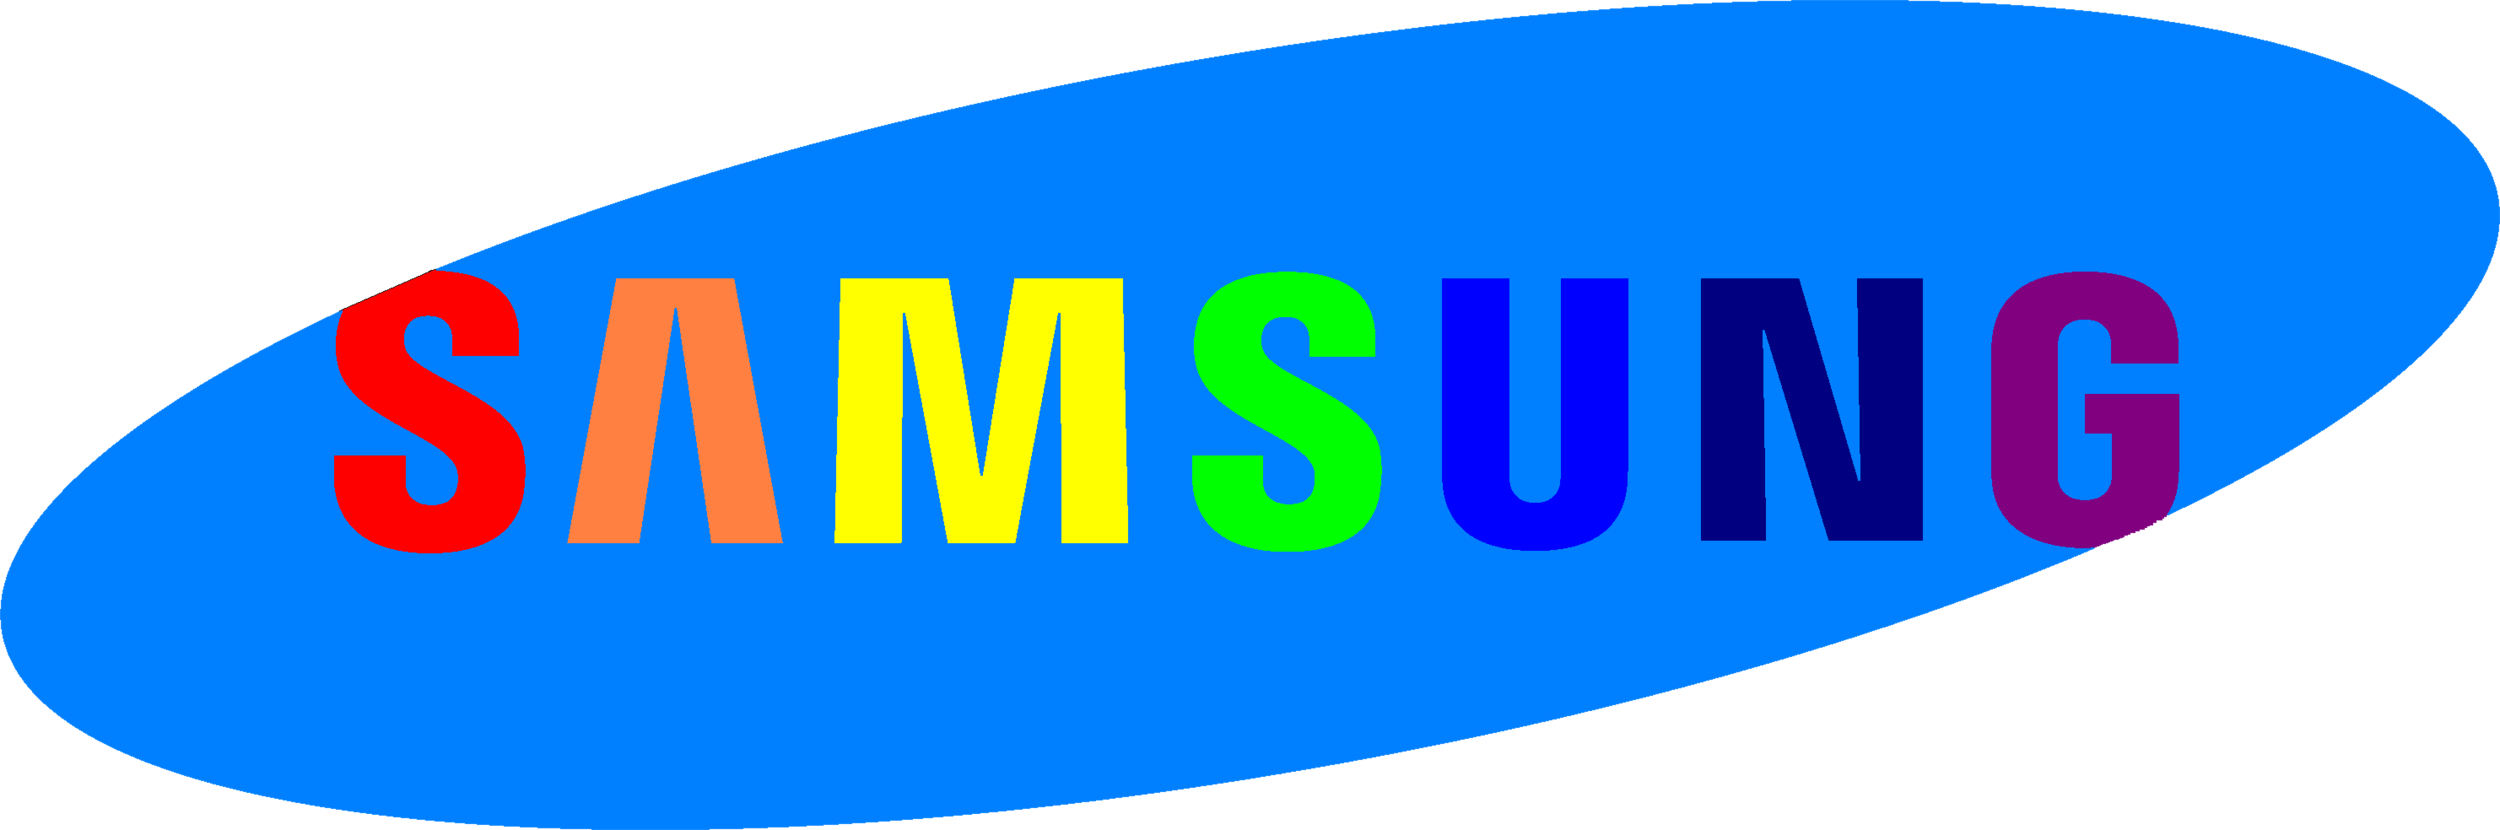 samsung-logo-png-samsung-logo-png-2963.png